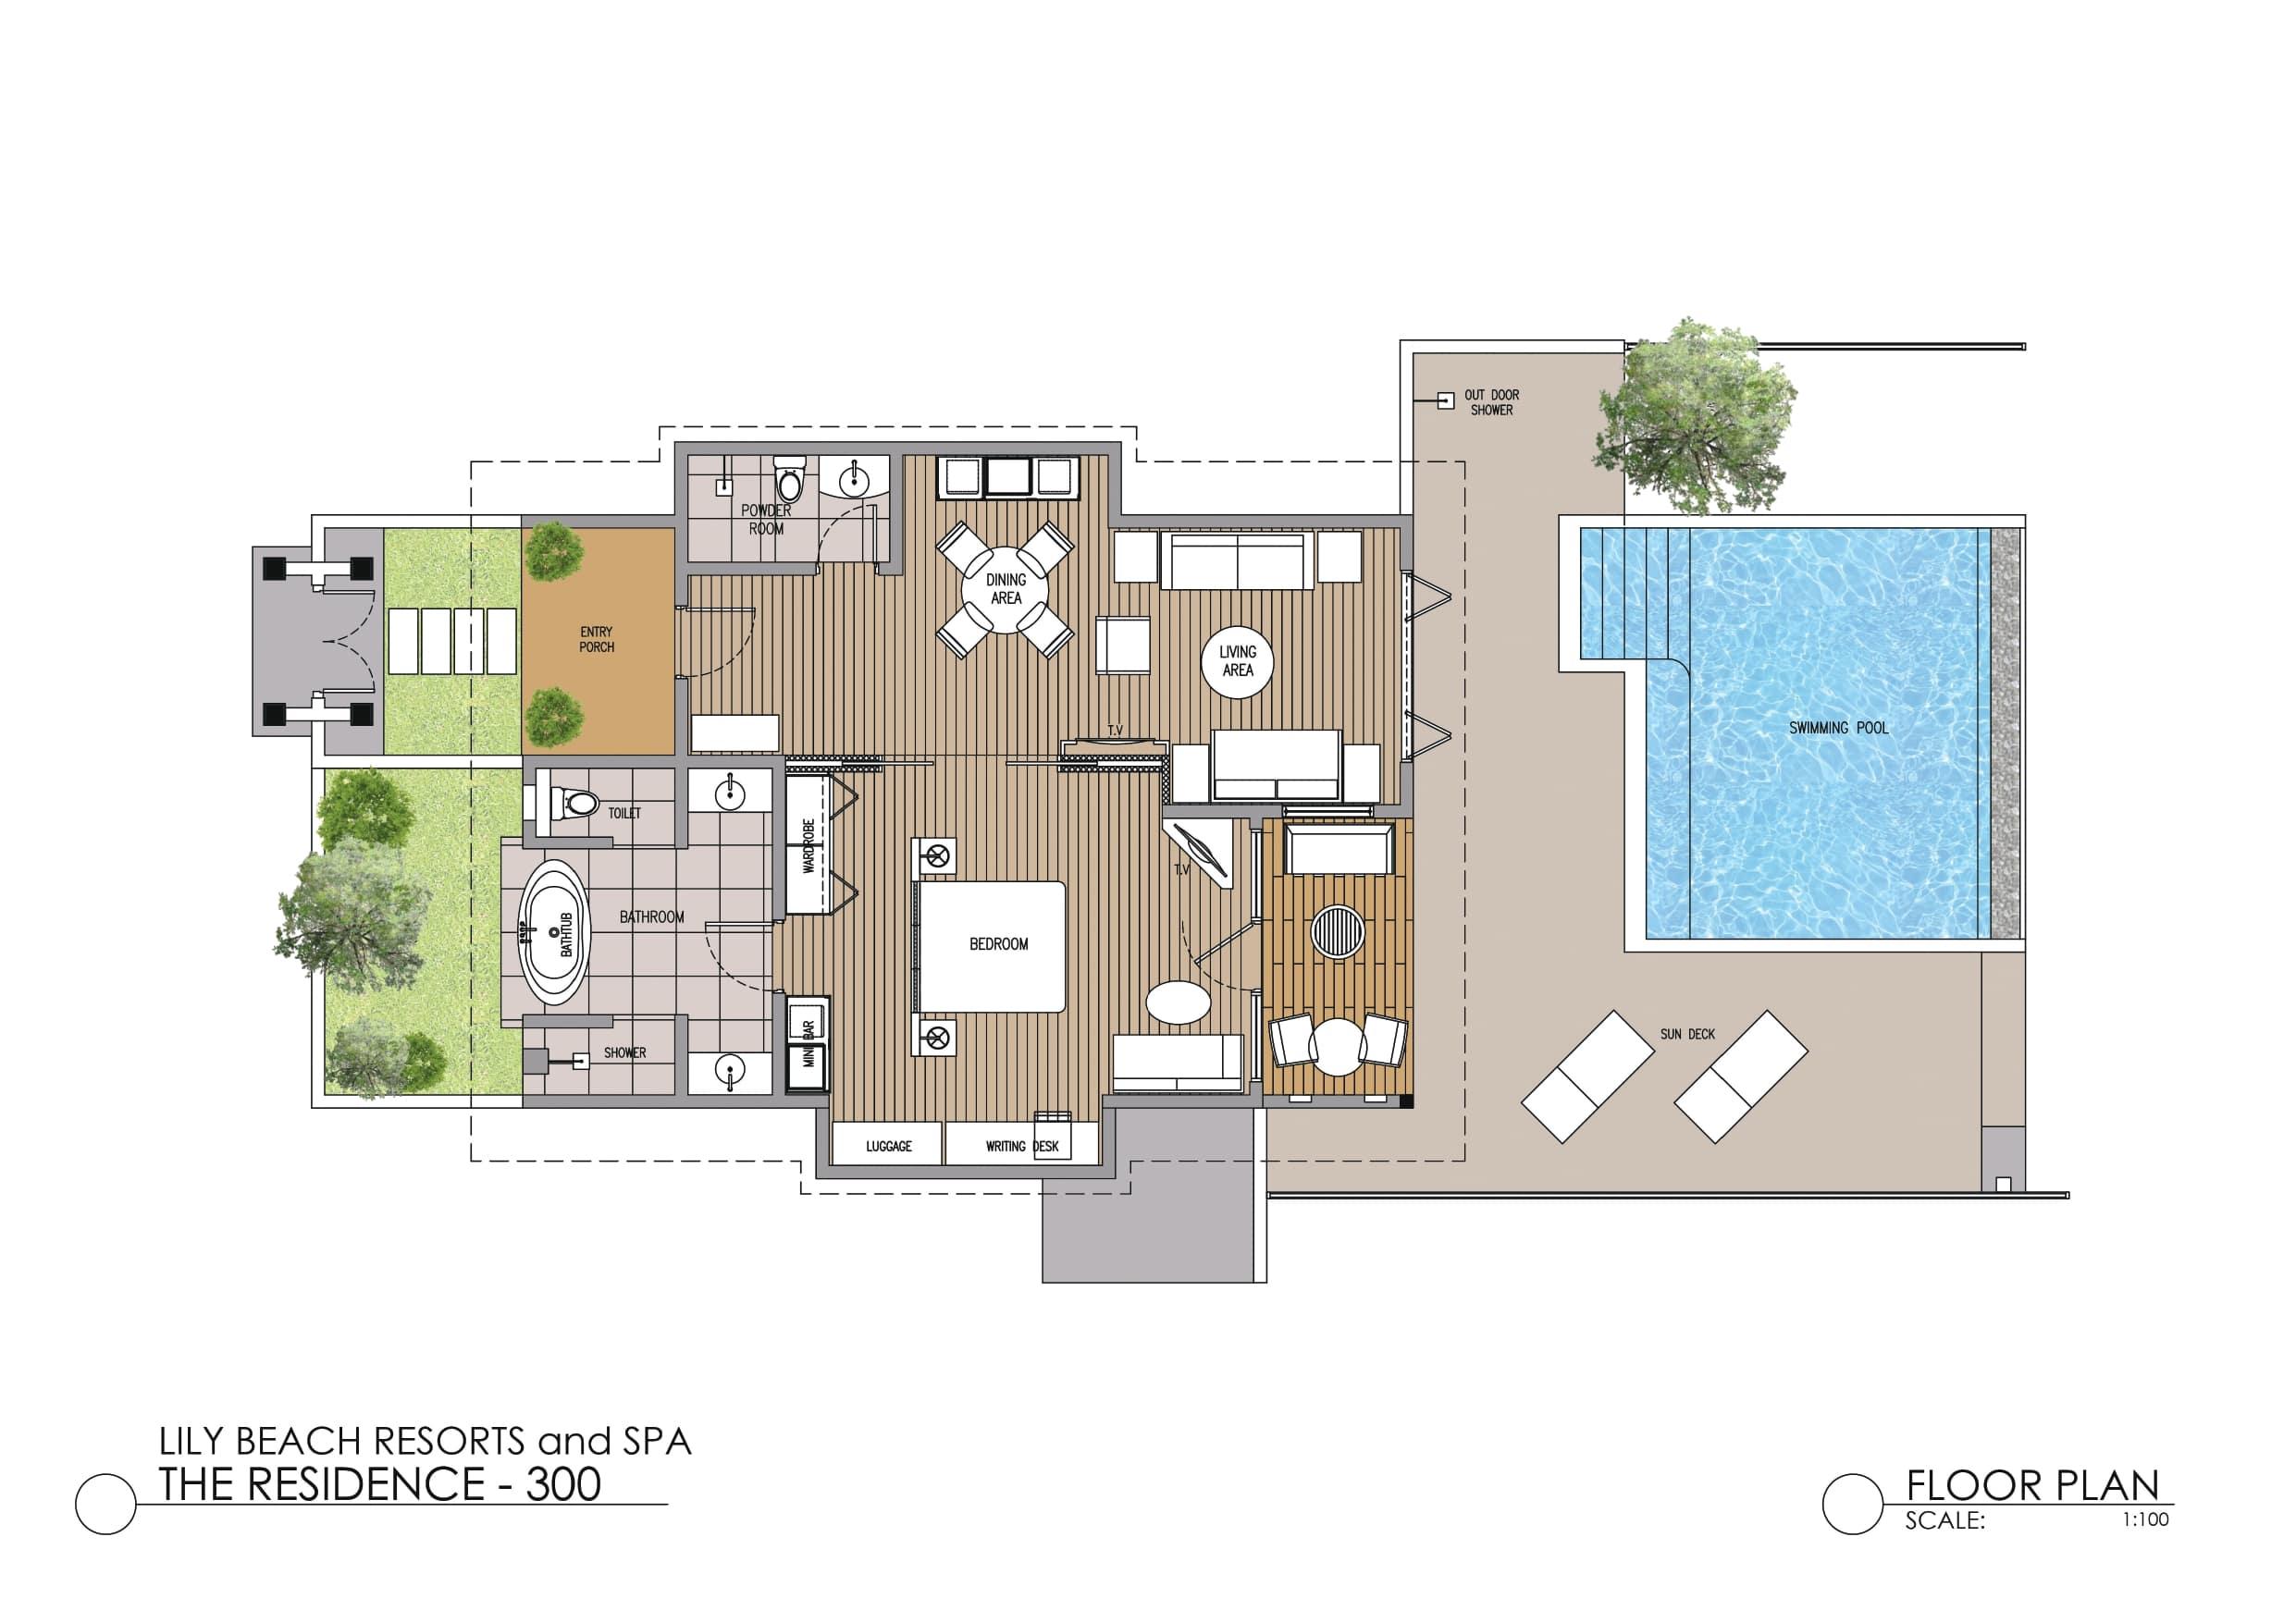 Мальдивы, отель Lily Beach Resort, план-схема номера Beach Residence with Pool